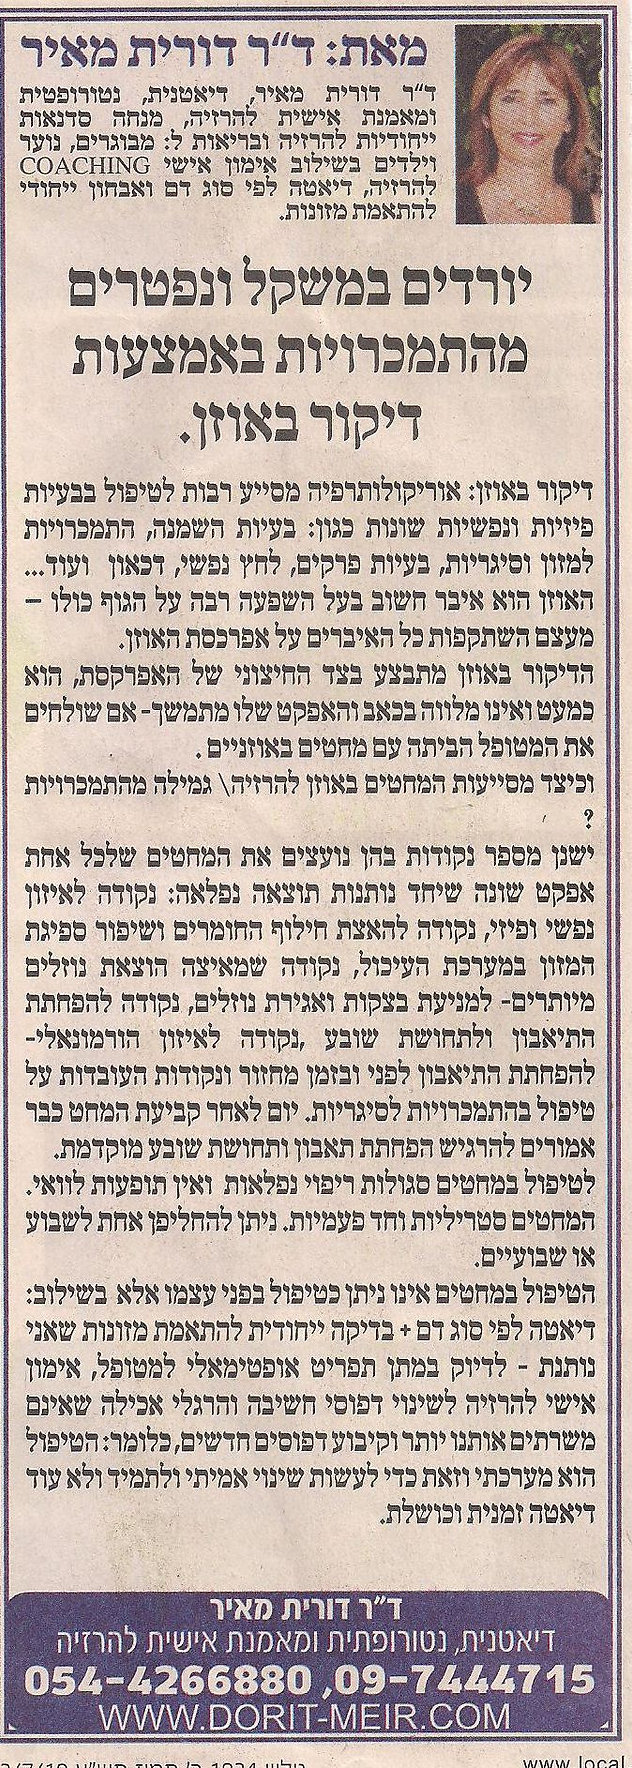 דיקור באוזן כתבה בעיתון